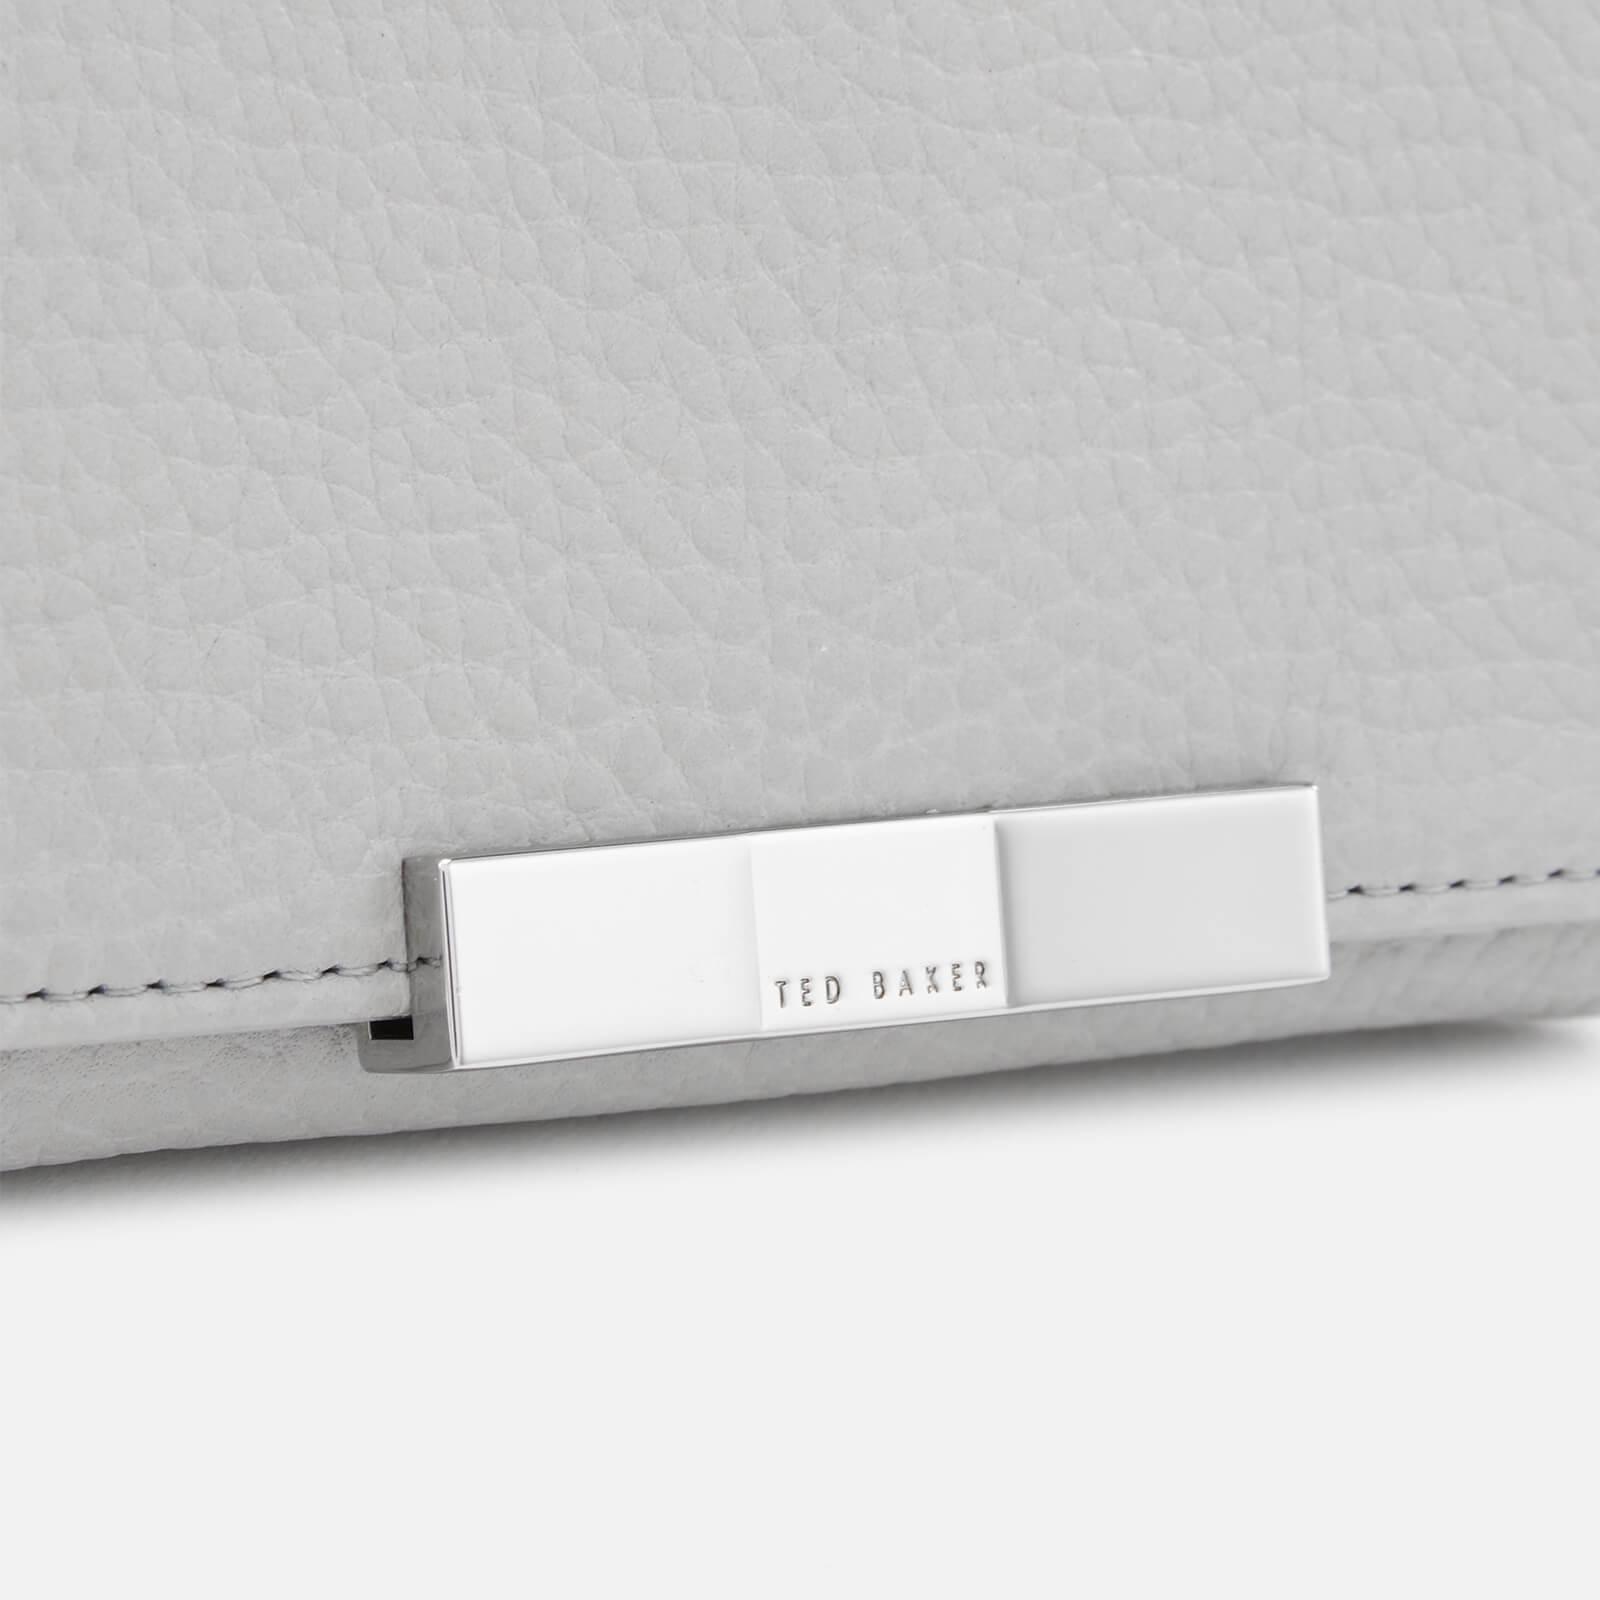 0d5d4ba4c9e Ted Baker Elodyy Textured Mini Purse in Gray - Lyst